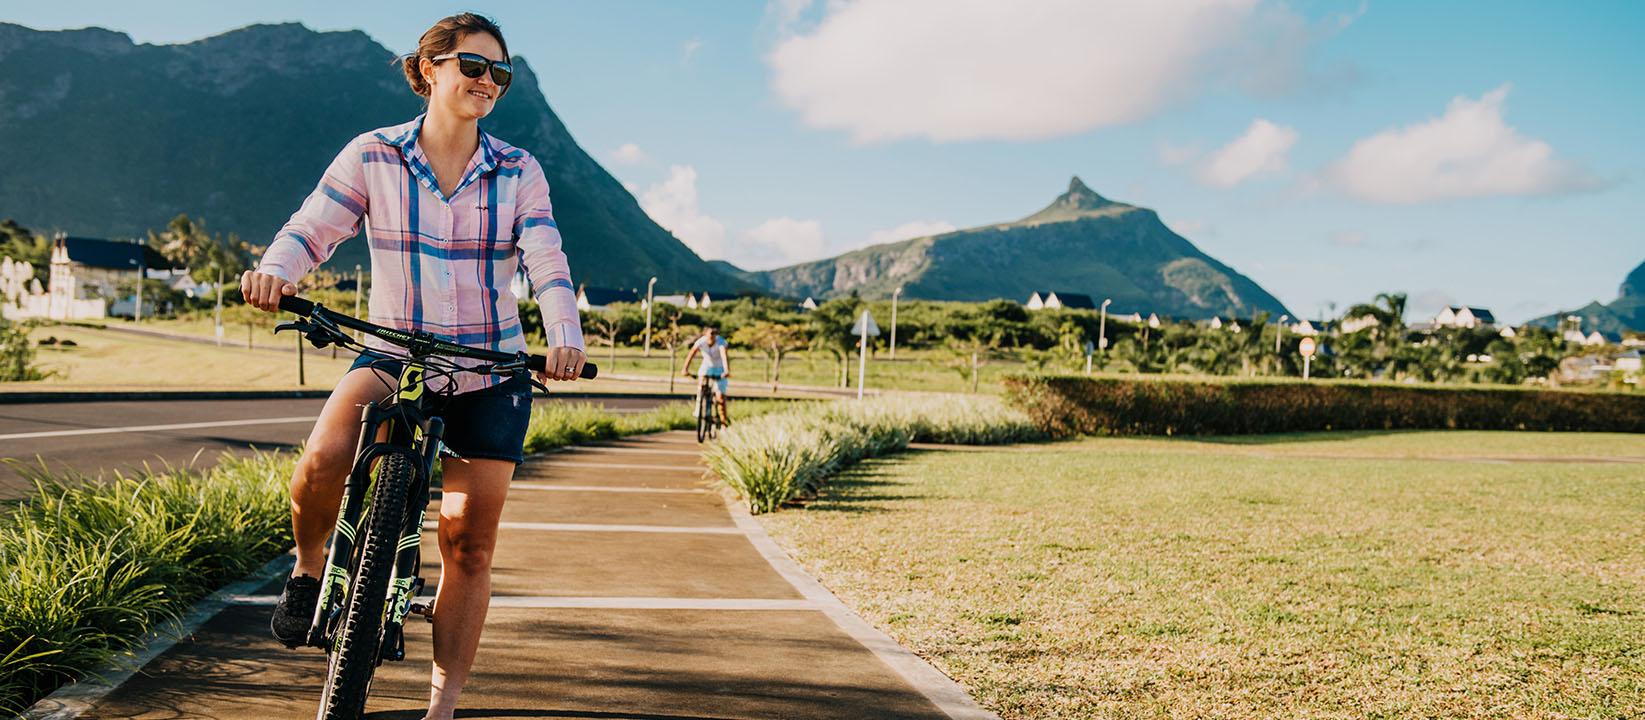 sports individuels, sport à moka, activités en plein air